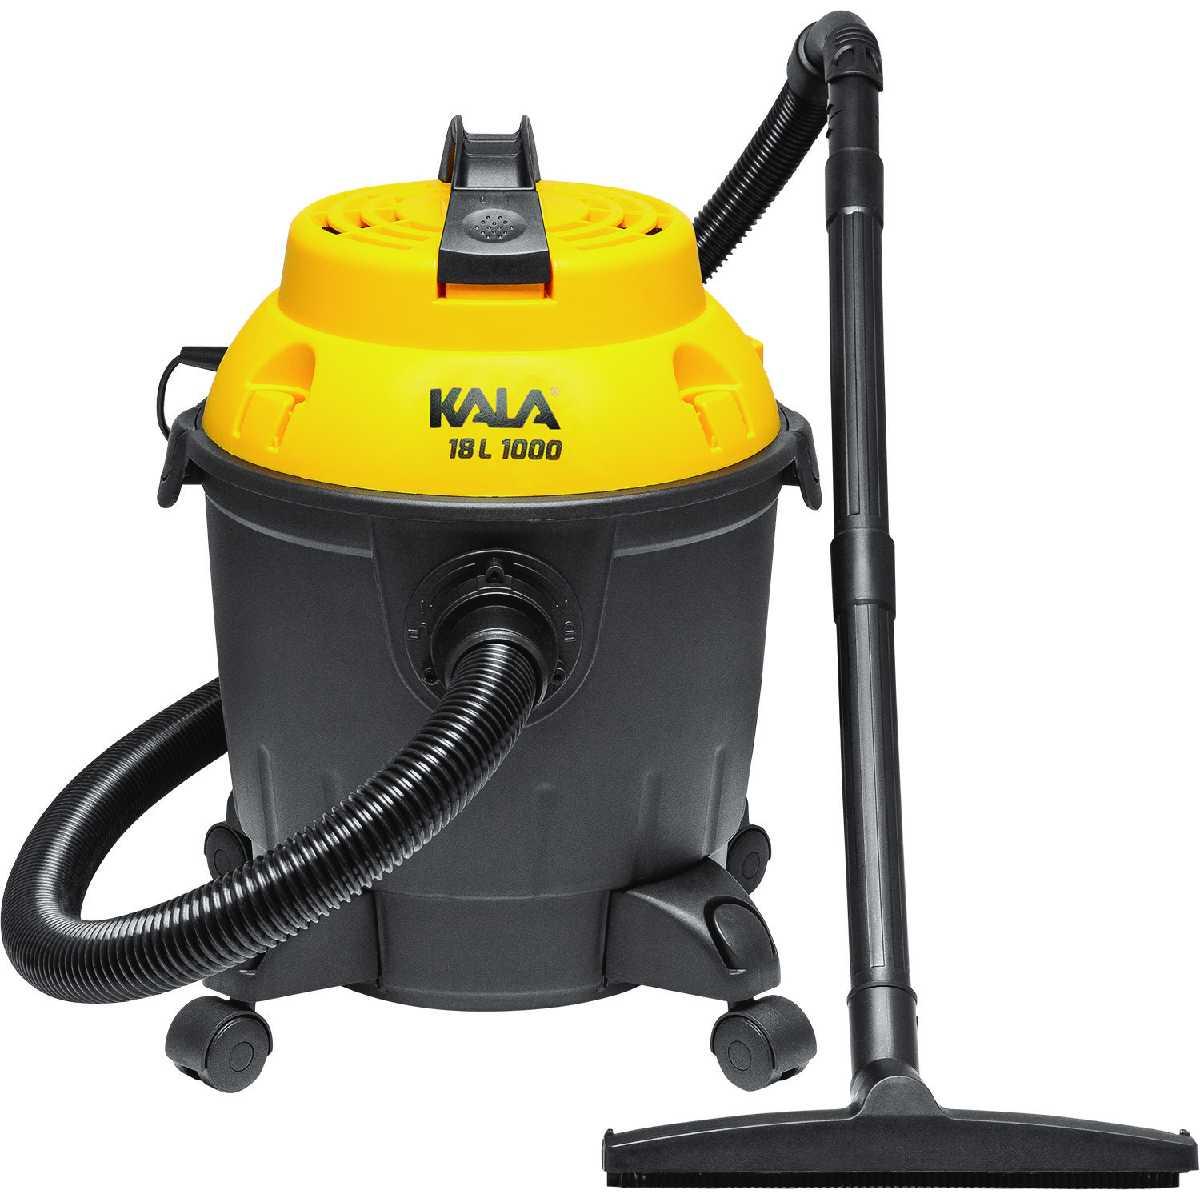 Aspirador de Pó e Água 18L 1000W Kala 127V